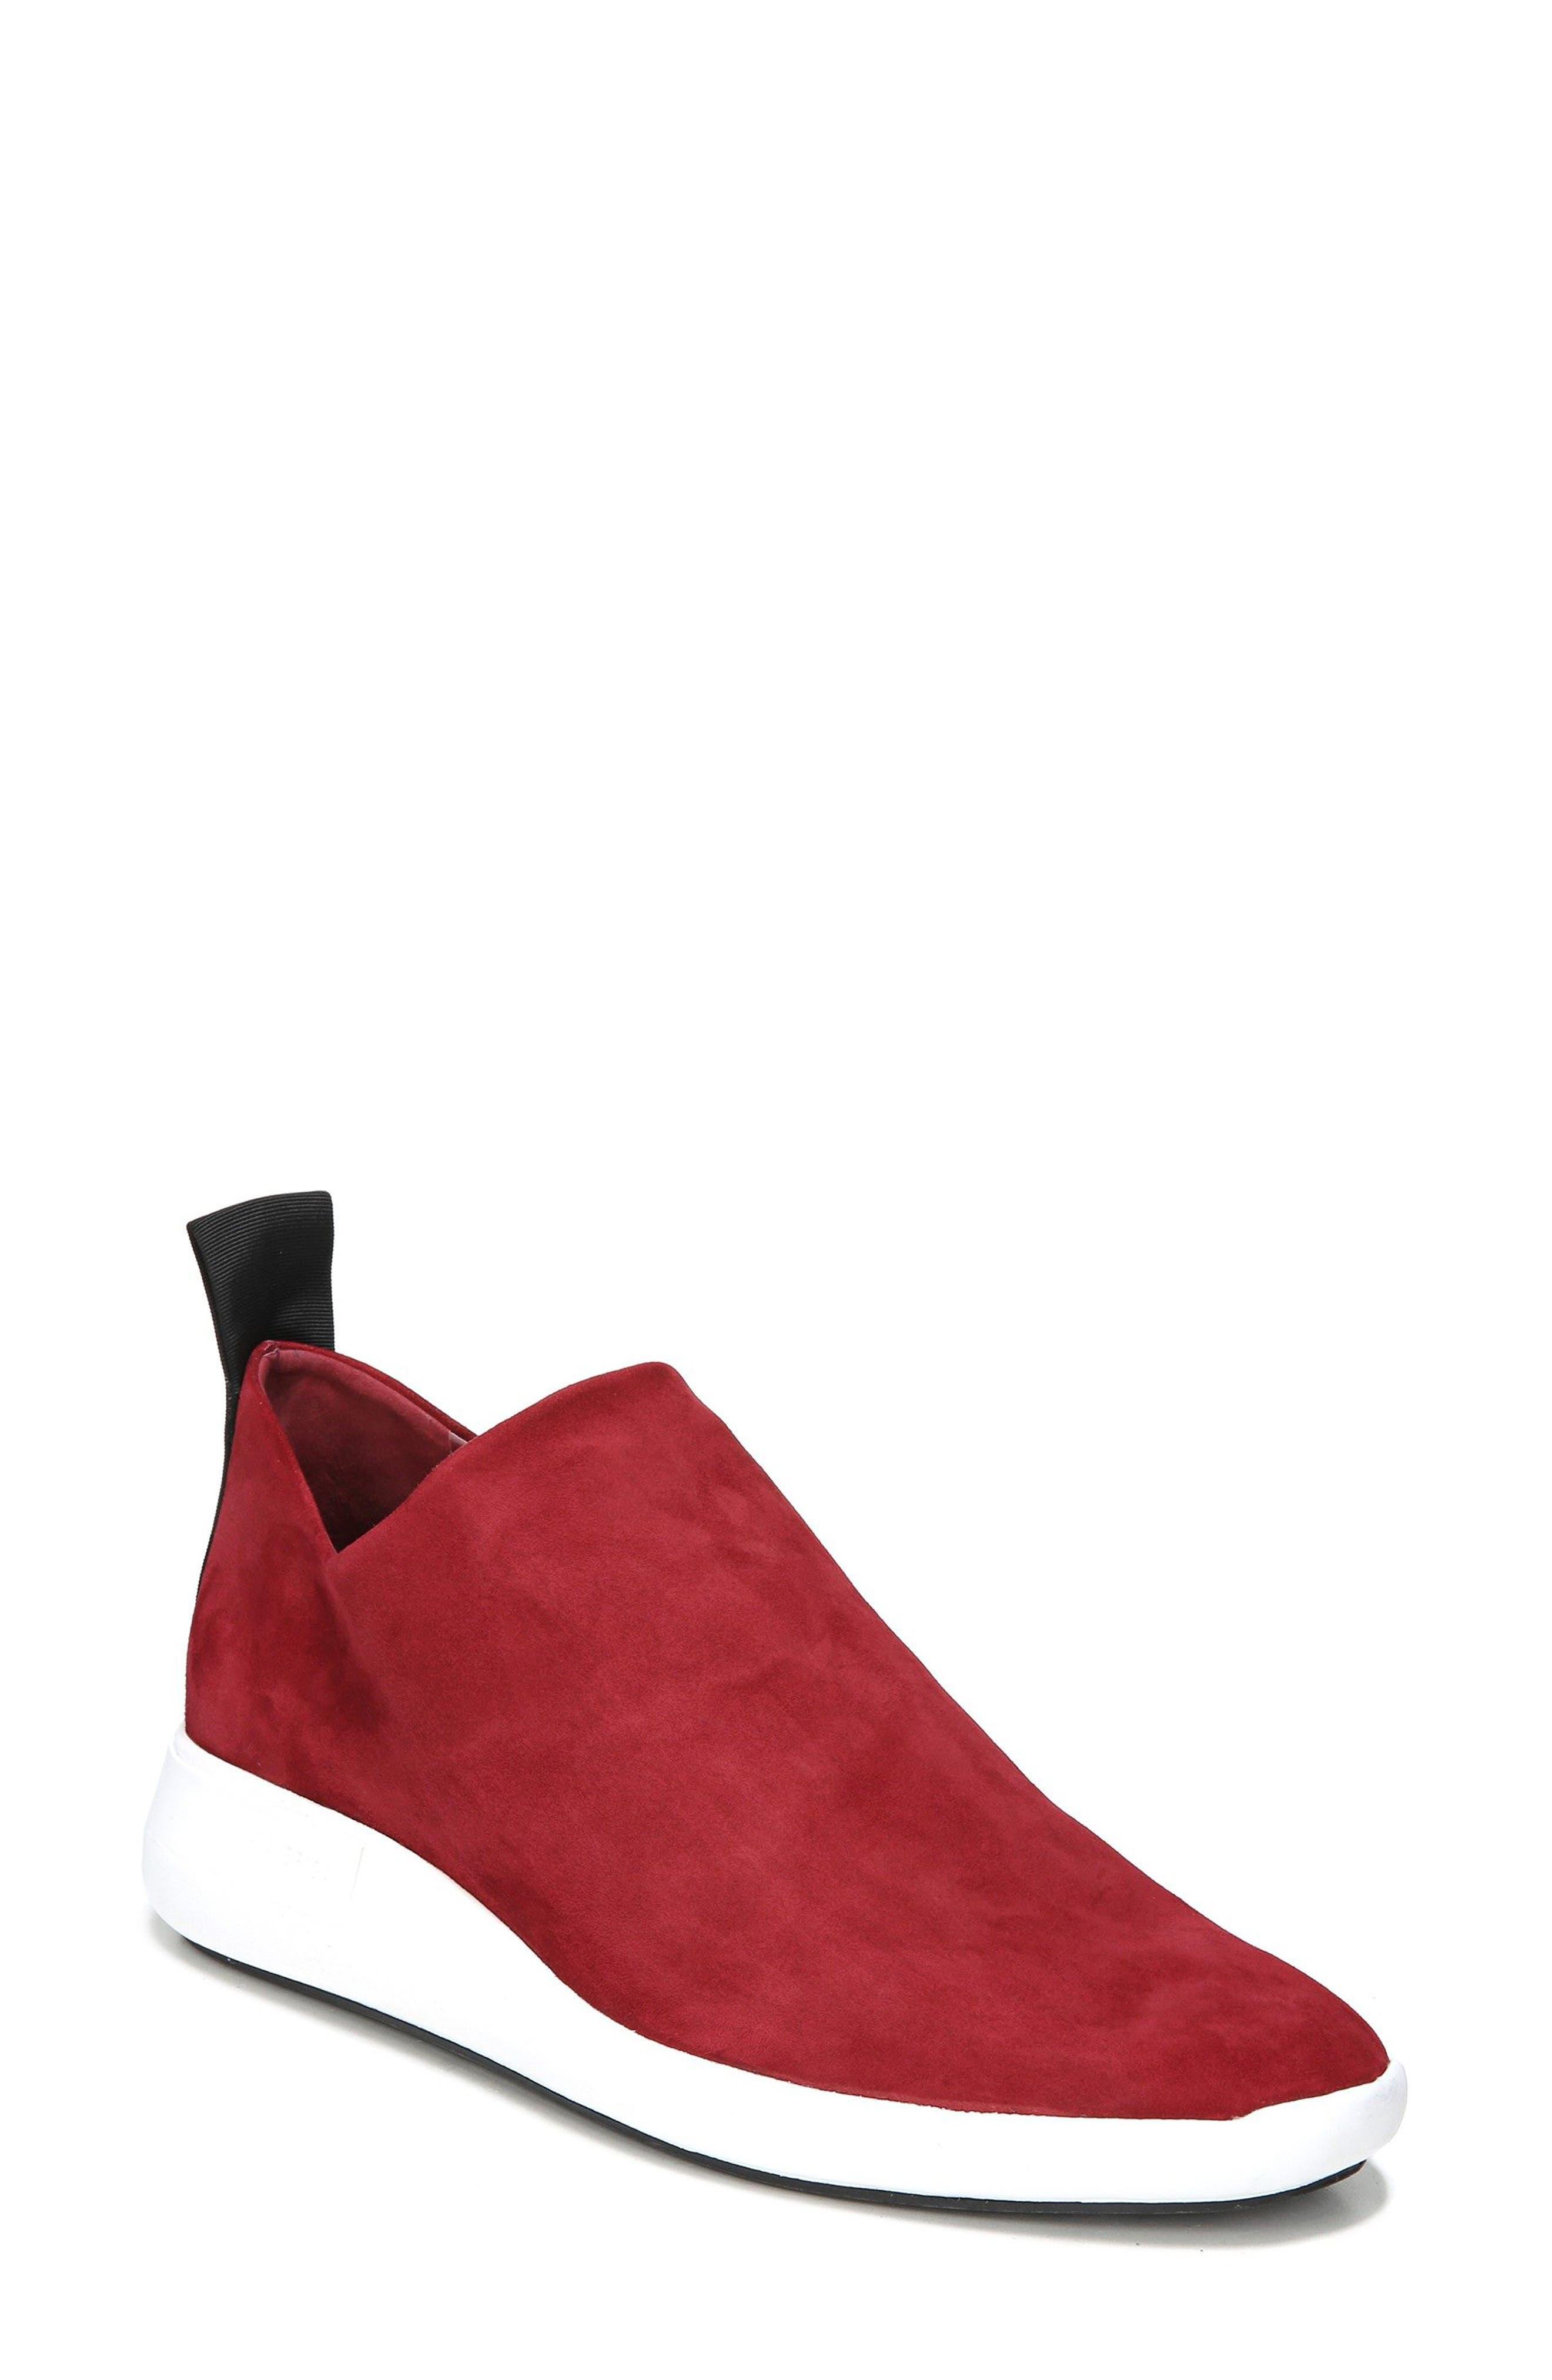 Marlow Slip-On Sneaker,                         Main,                         color, Ruby Suede